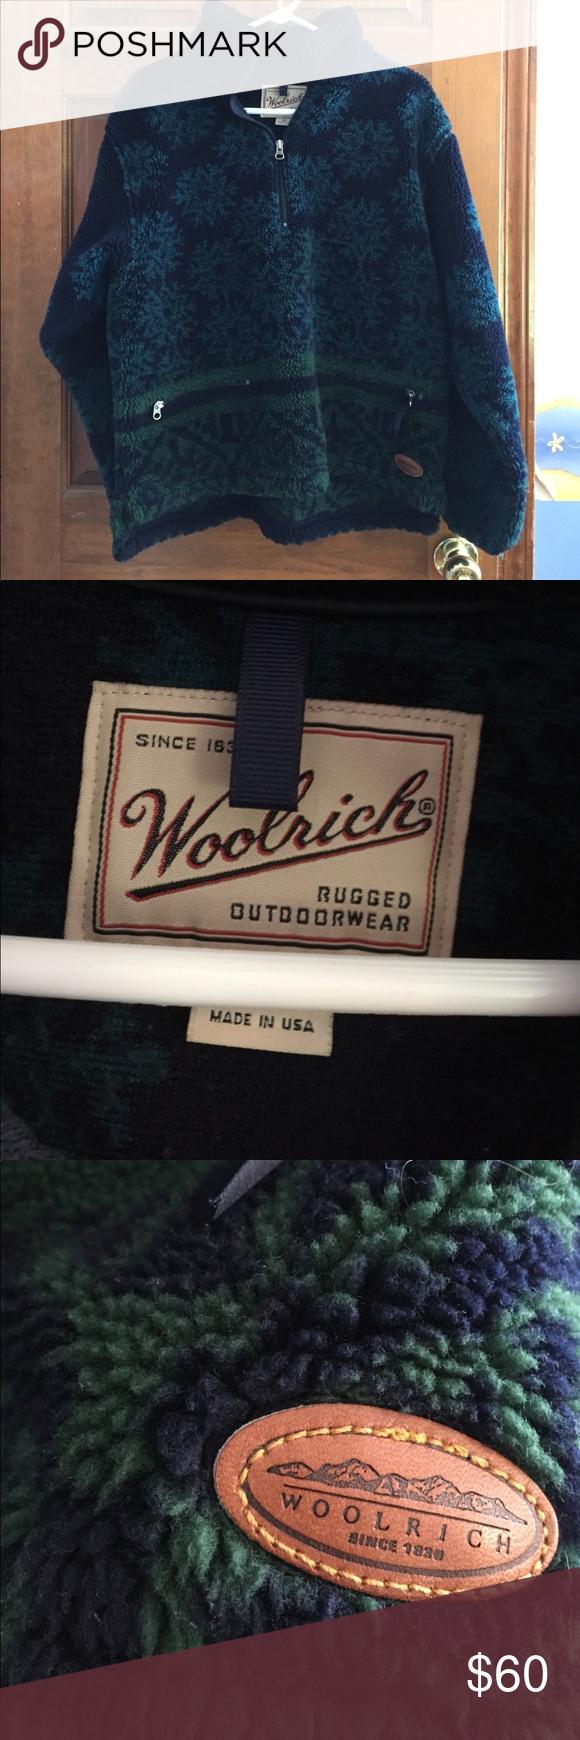 Amazing vintage woolrich fleece jacket